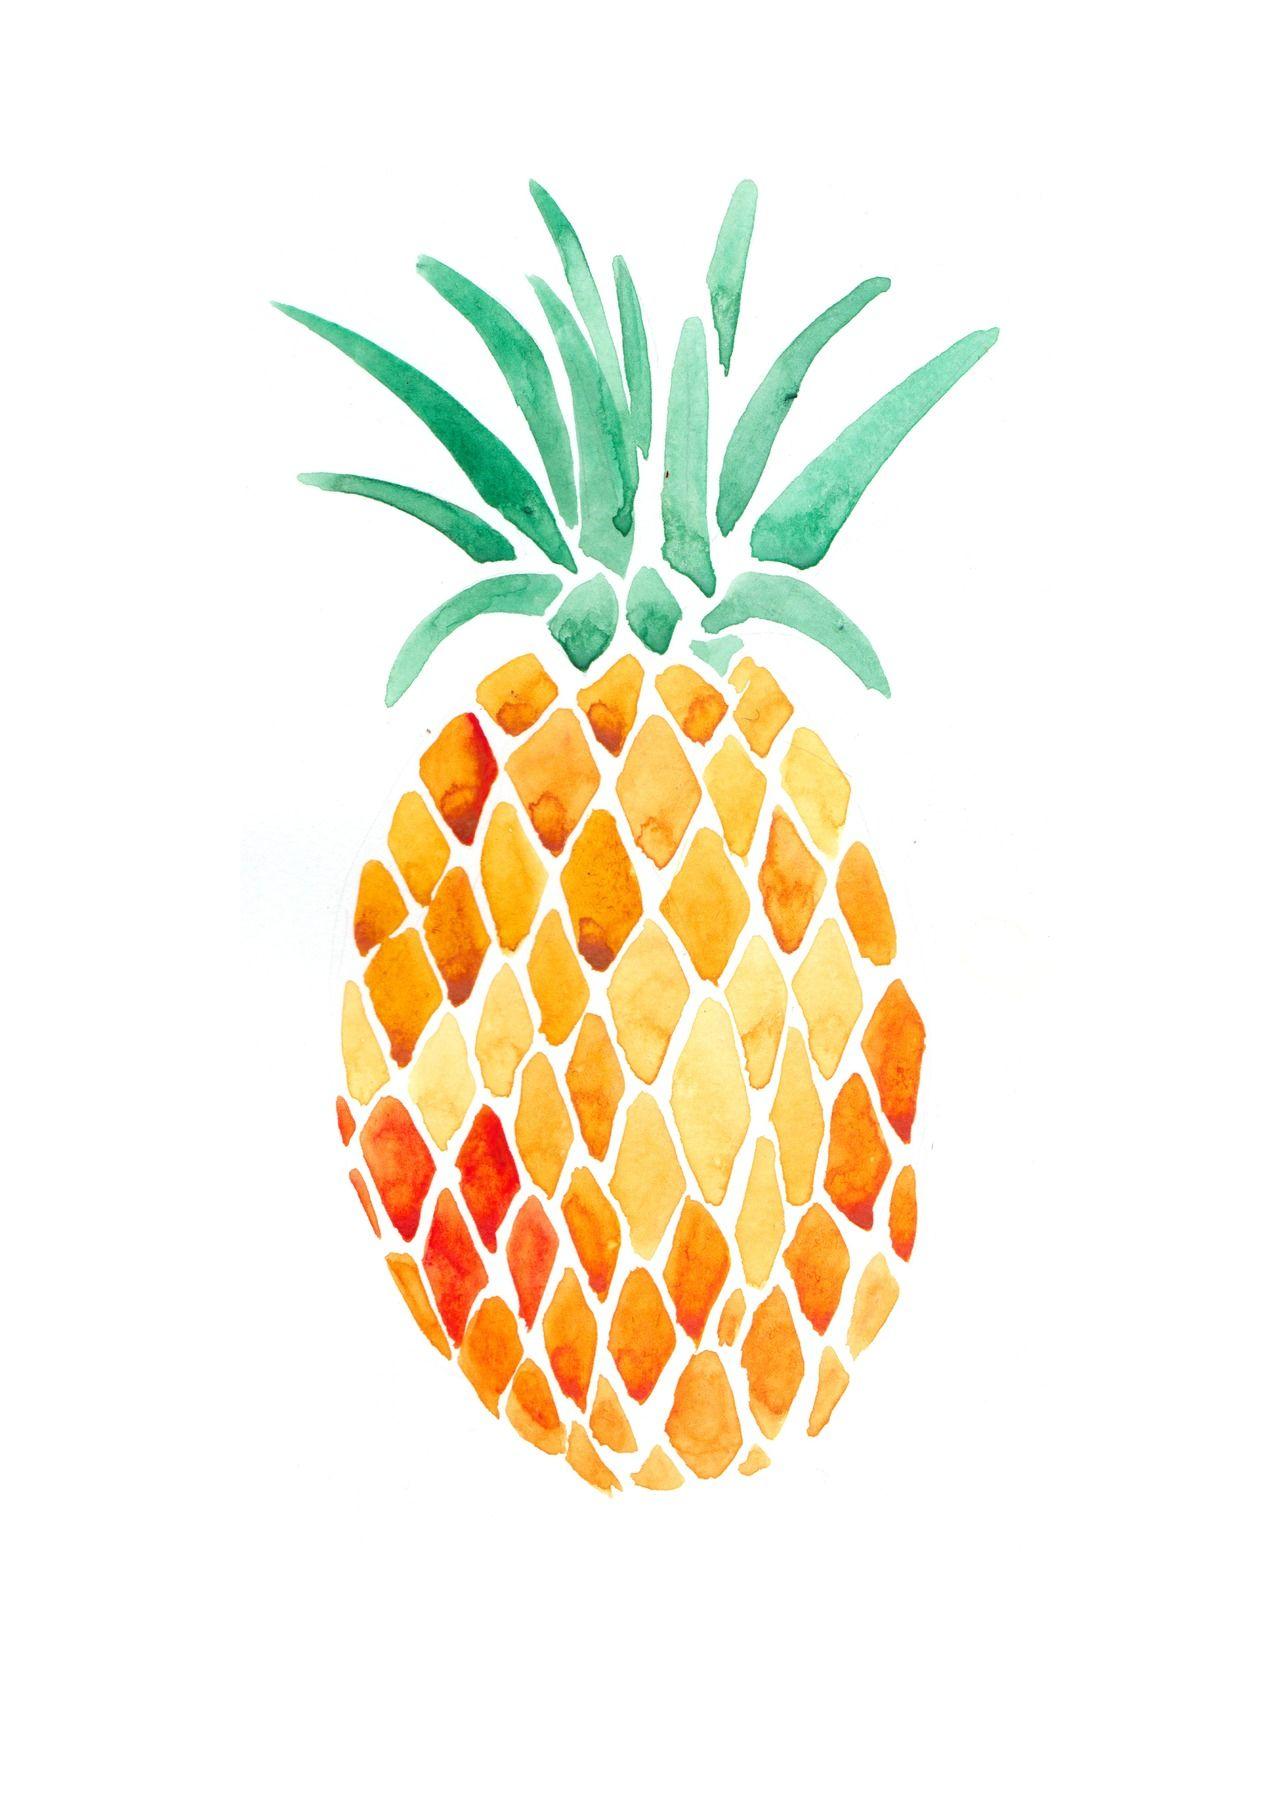 Roxy Wallpaper Iphone Pineapple Party Anyone Art Amp Design Pinterest